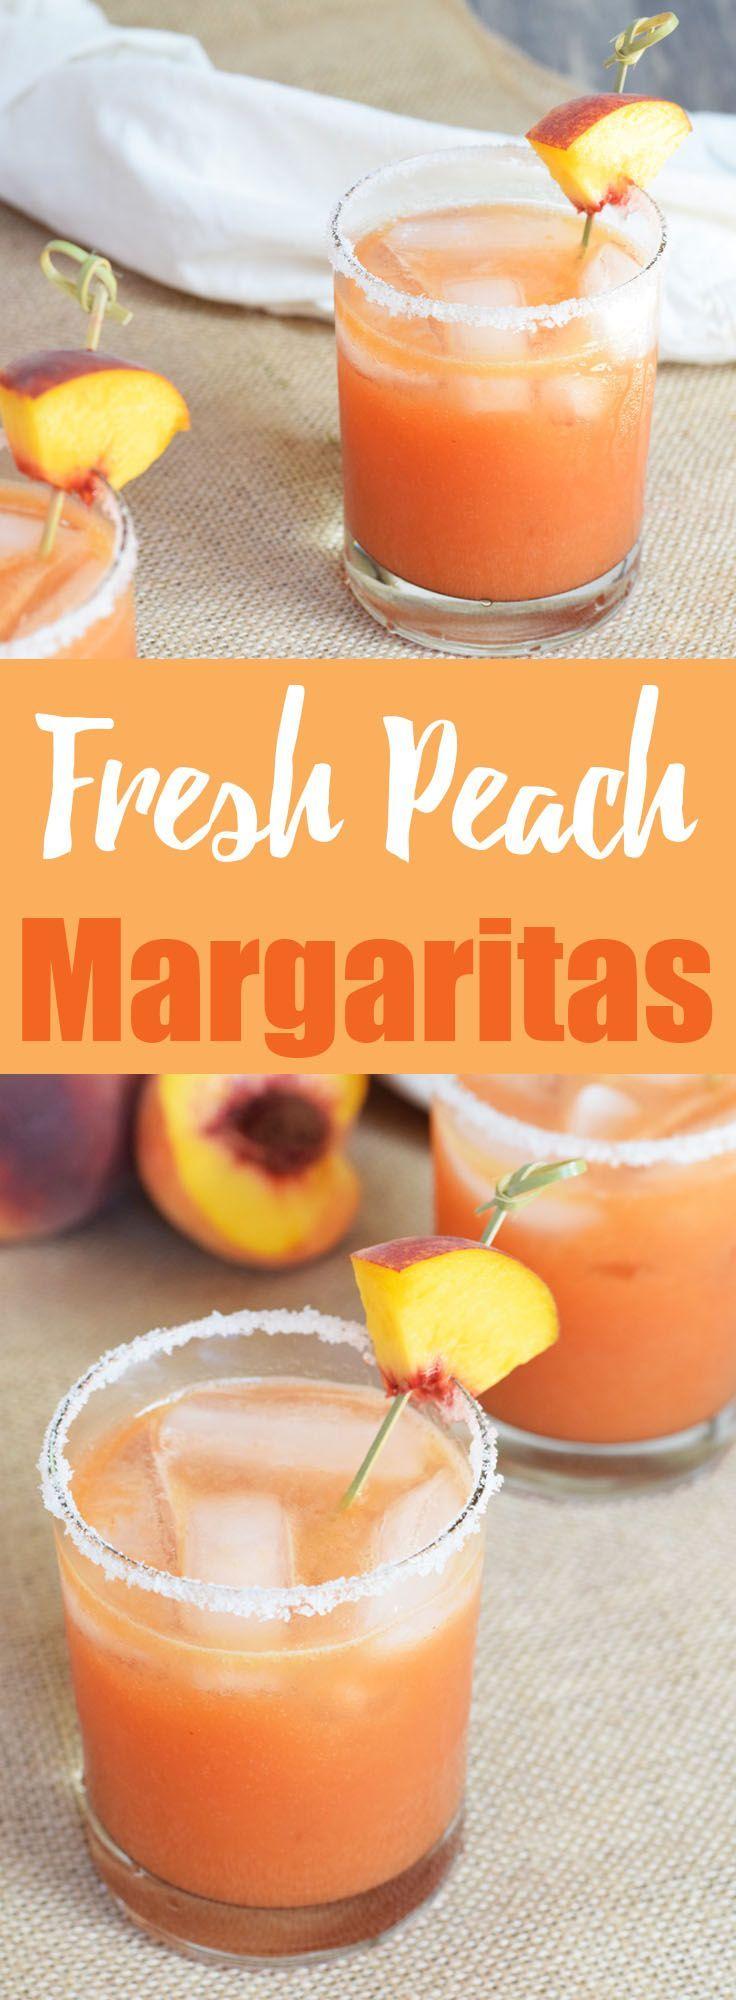 Fresh Peach Margaritas from Living Loving Paleo! {wineglasswriter.com}